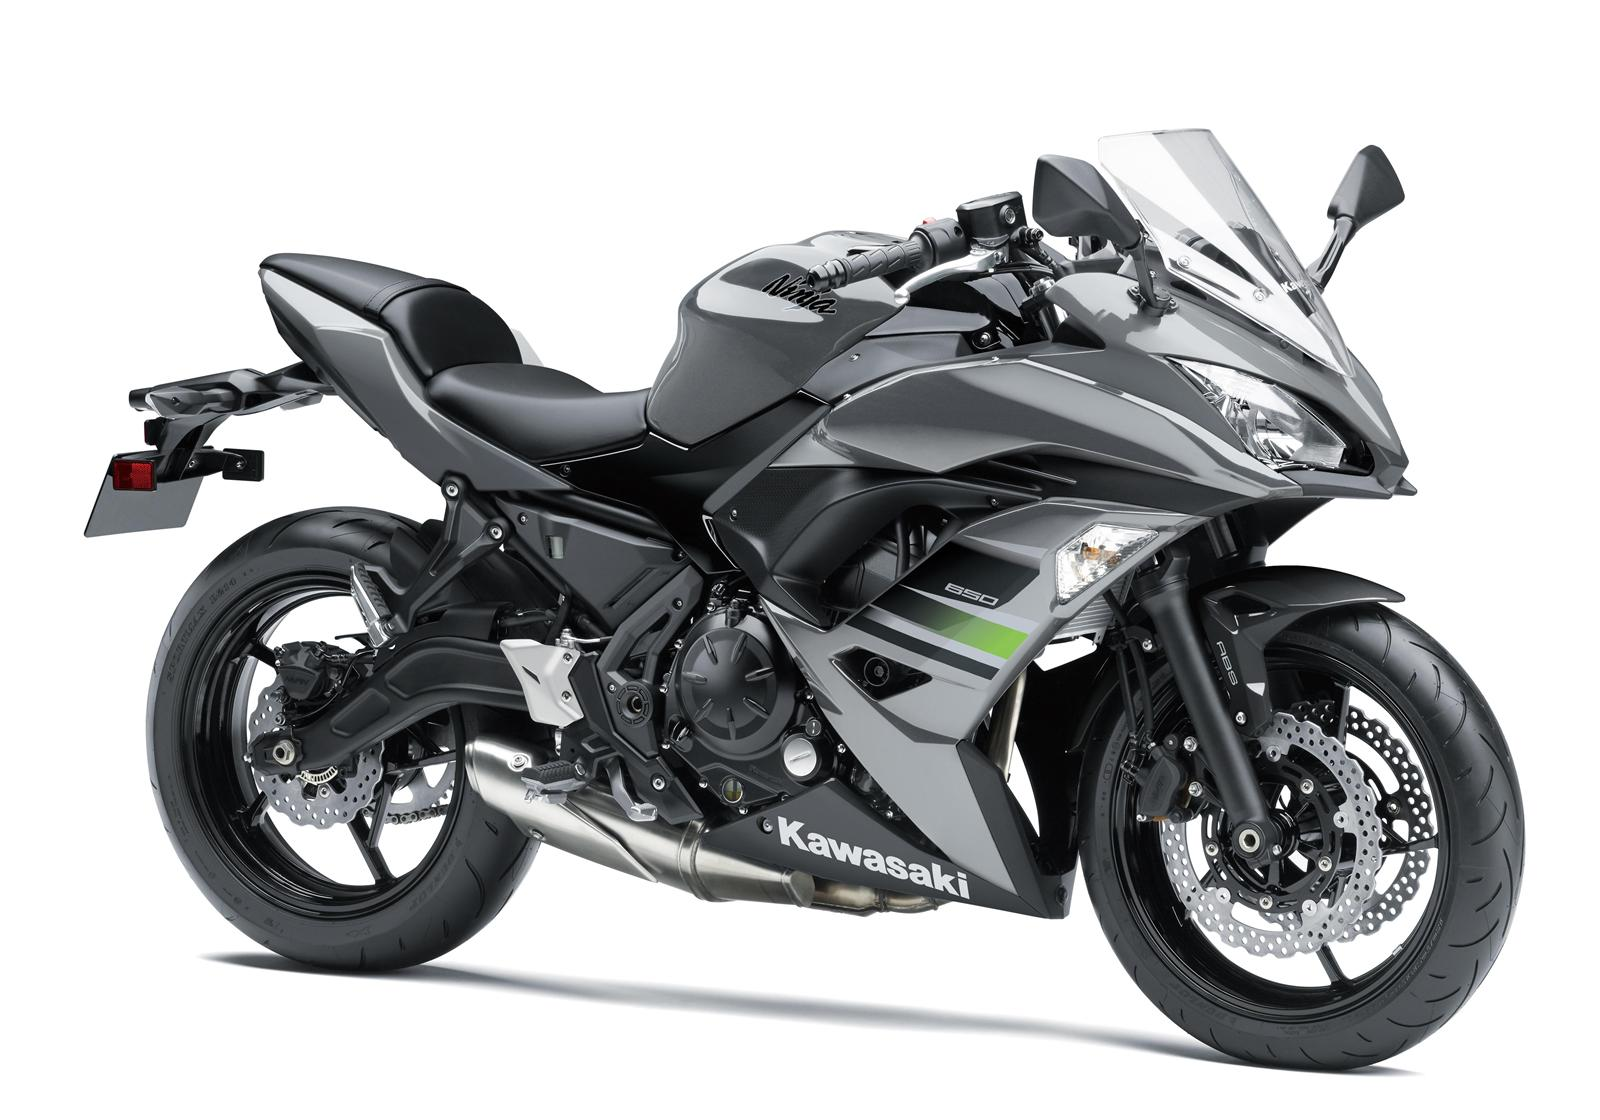 Precios del Kawasaki Ninja 650